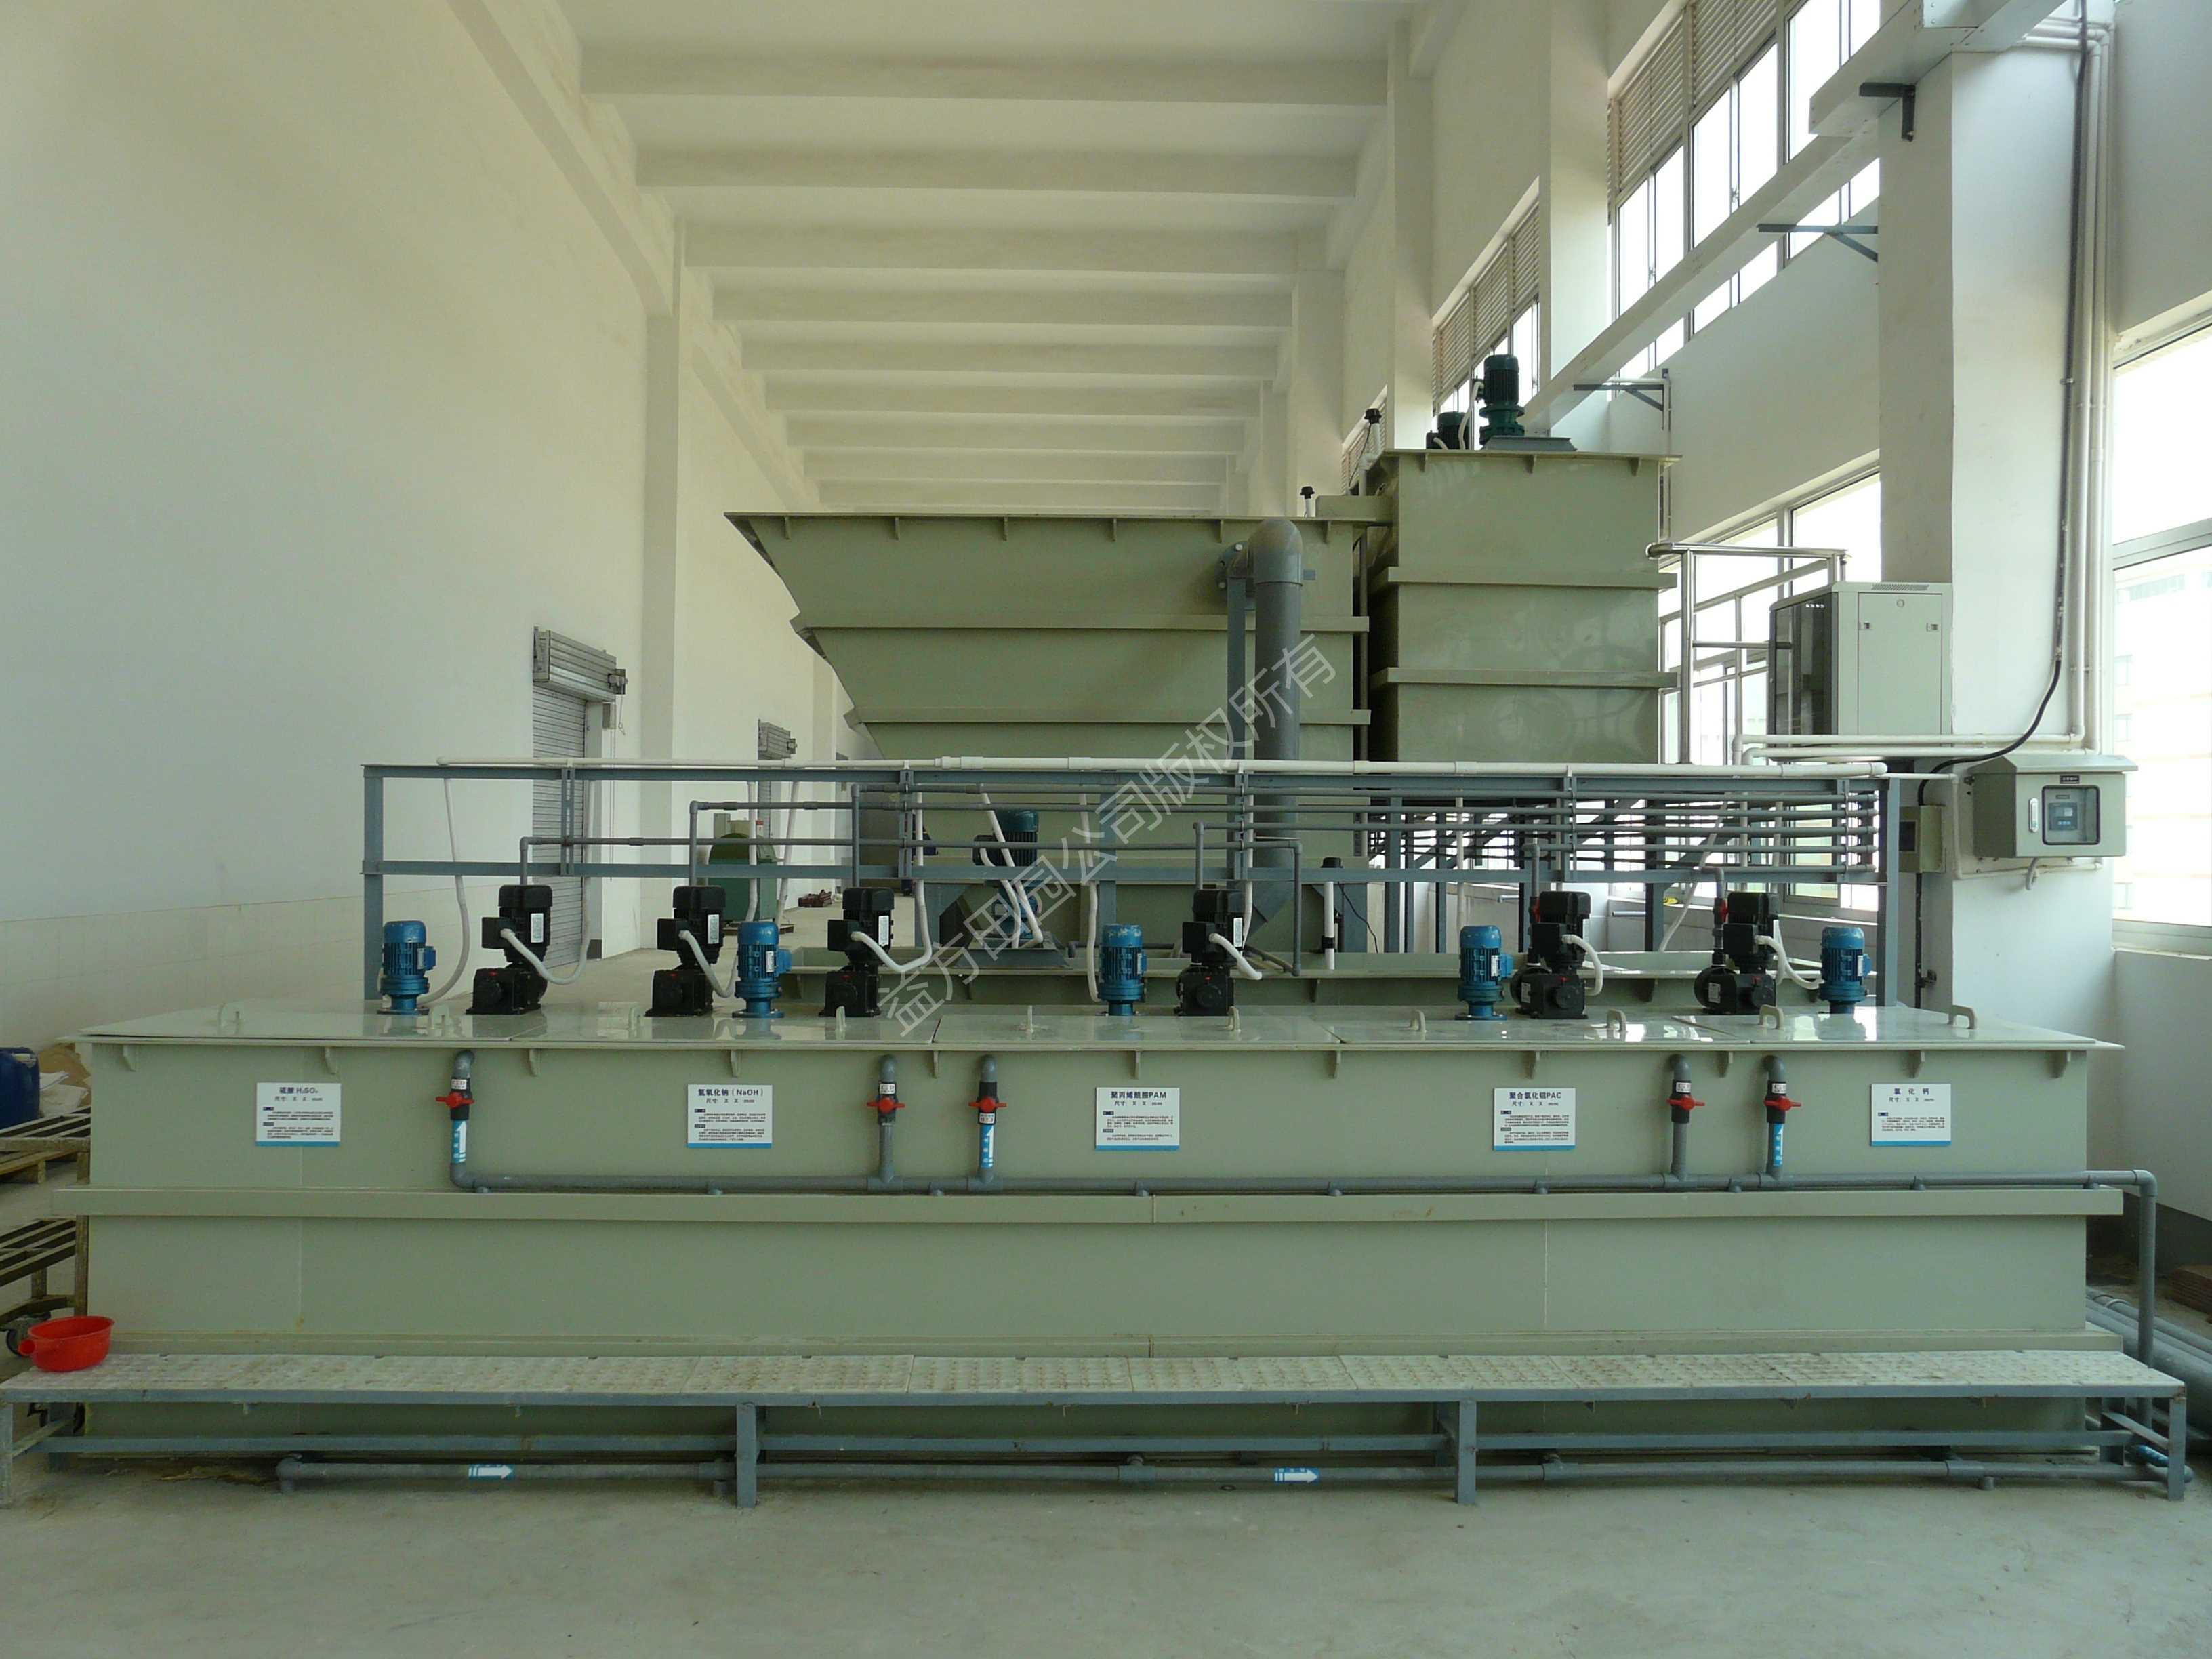 合肥某表面处理废水700T-P1030528